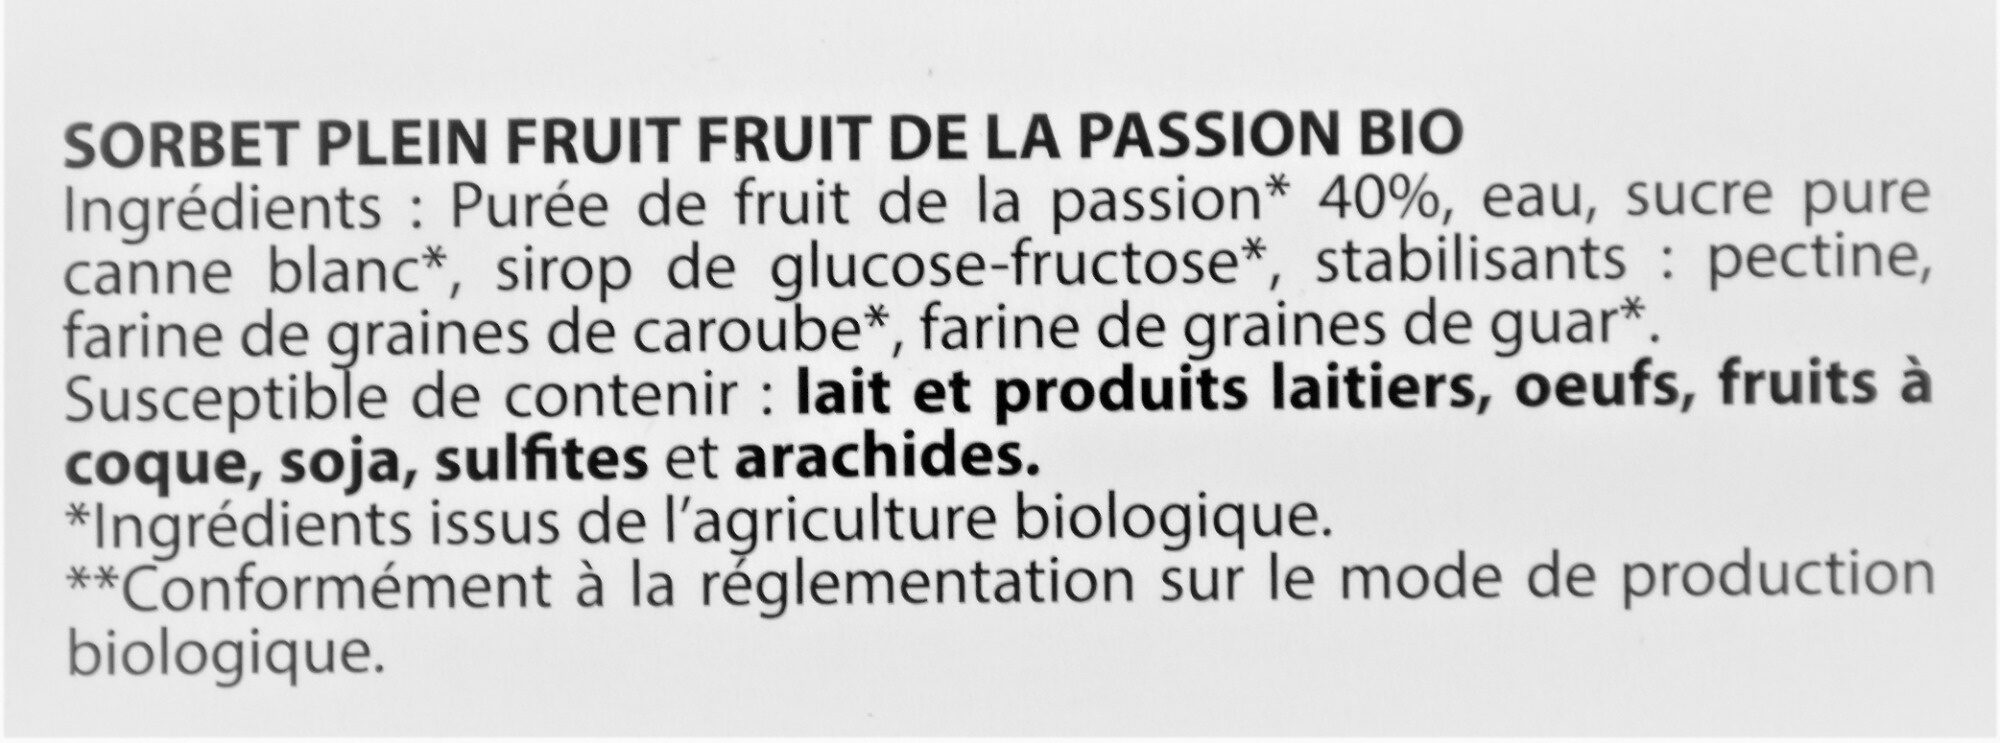 Sorbet plein fruit FRUIT DE LA PASSION BIO, 40% de fruit - Ingredients